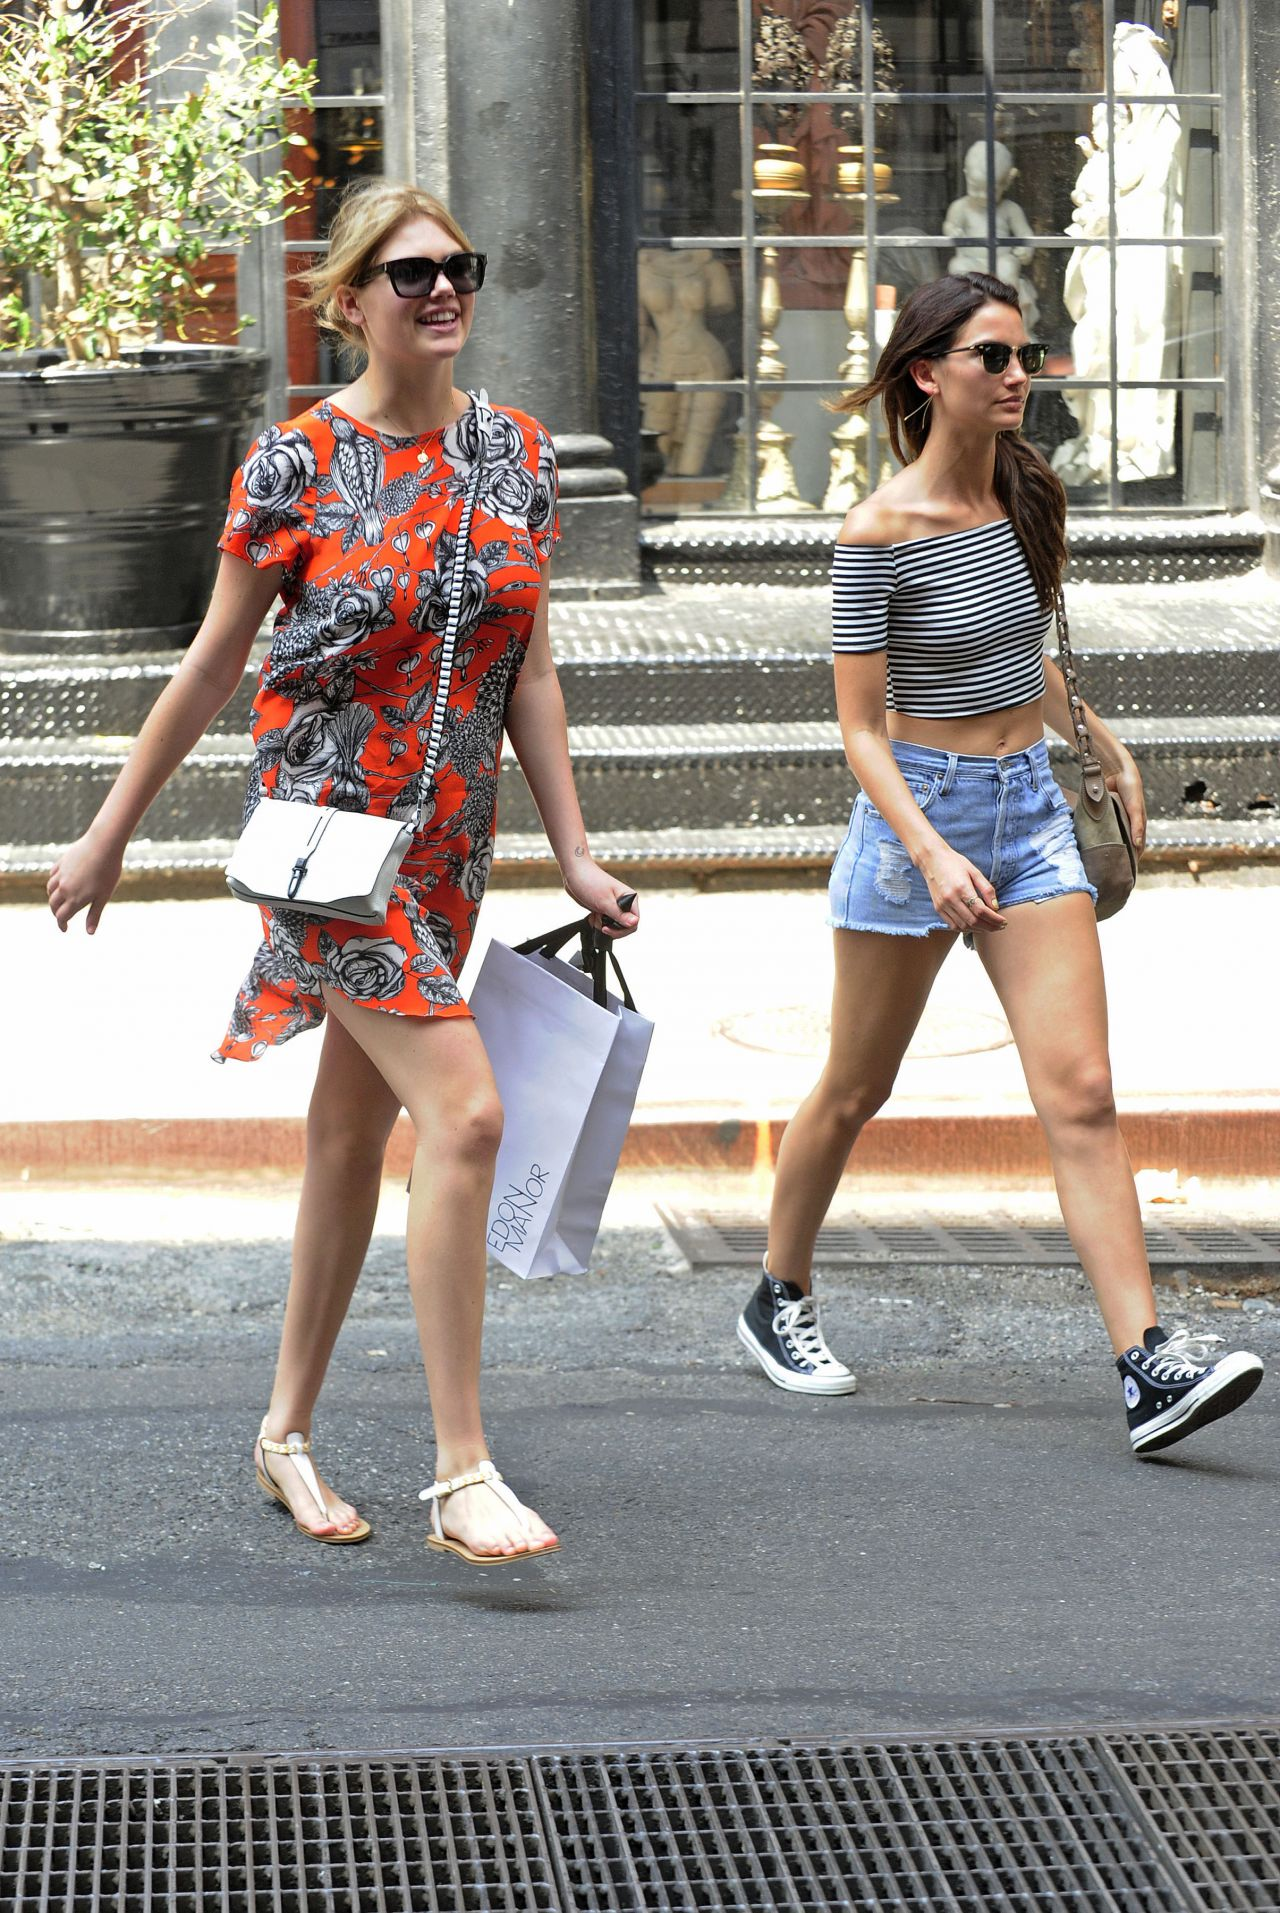 Scarlett Bordeaux ass,Pamela Anderson Sex Tape Sex image Brie Larson. 2018-2019 celebrityes photos leaks!,Jennifer Aniston Gets Breasts Stolen, So So Entertainment Blog Sued